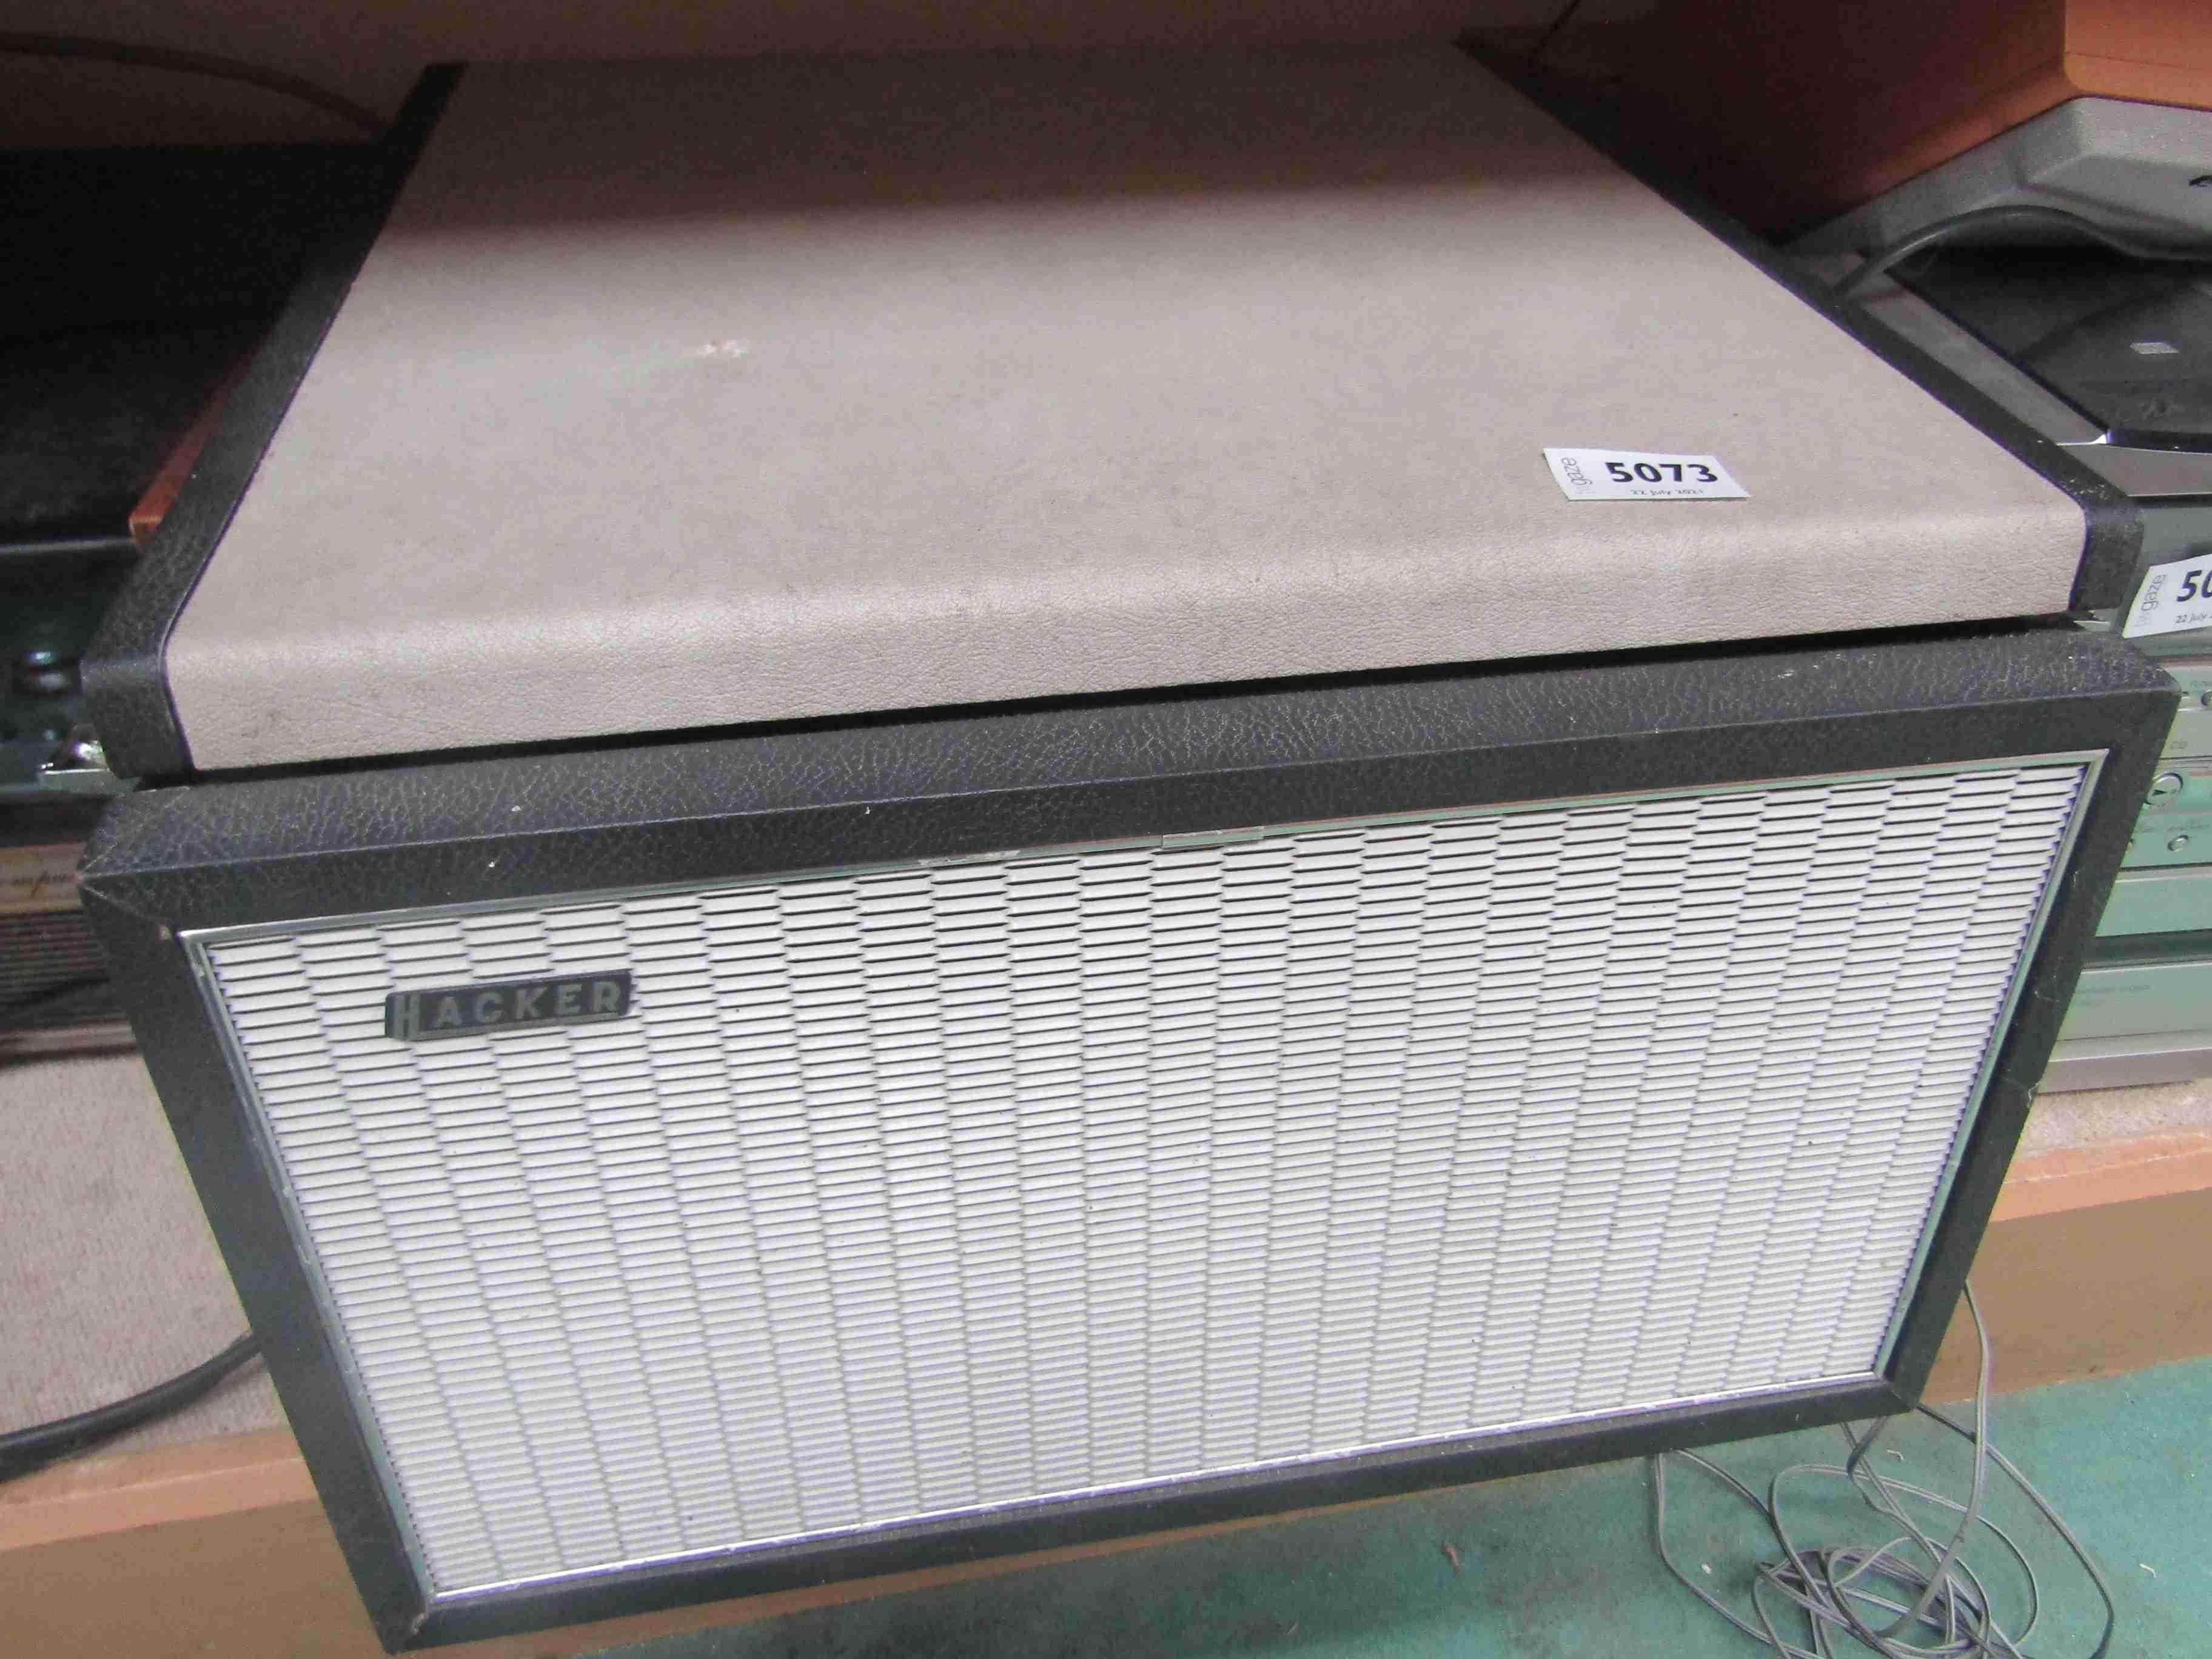 A vintage Hacker portable record player